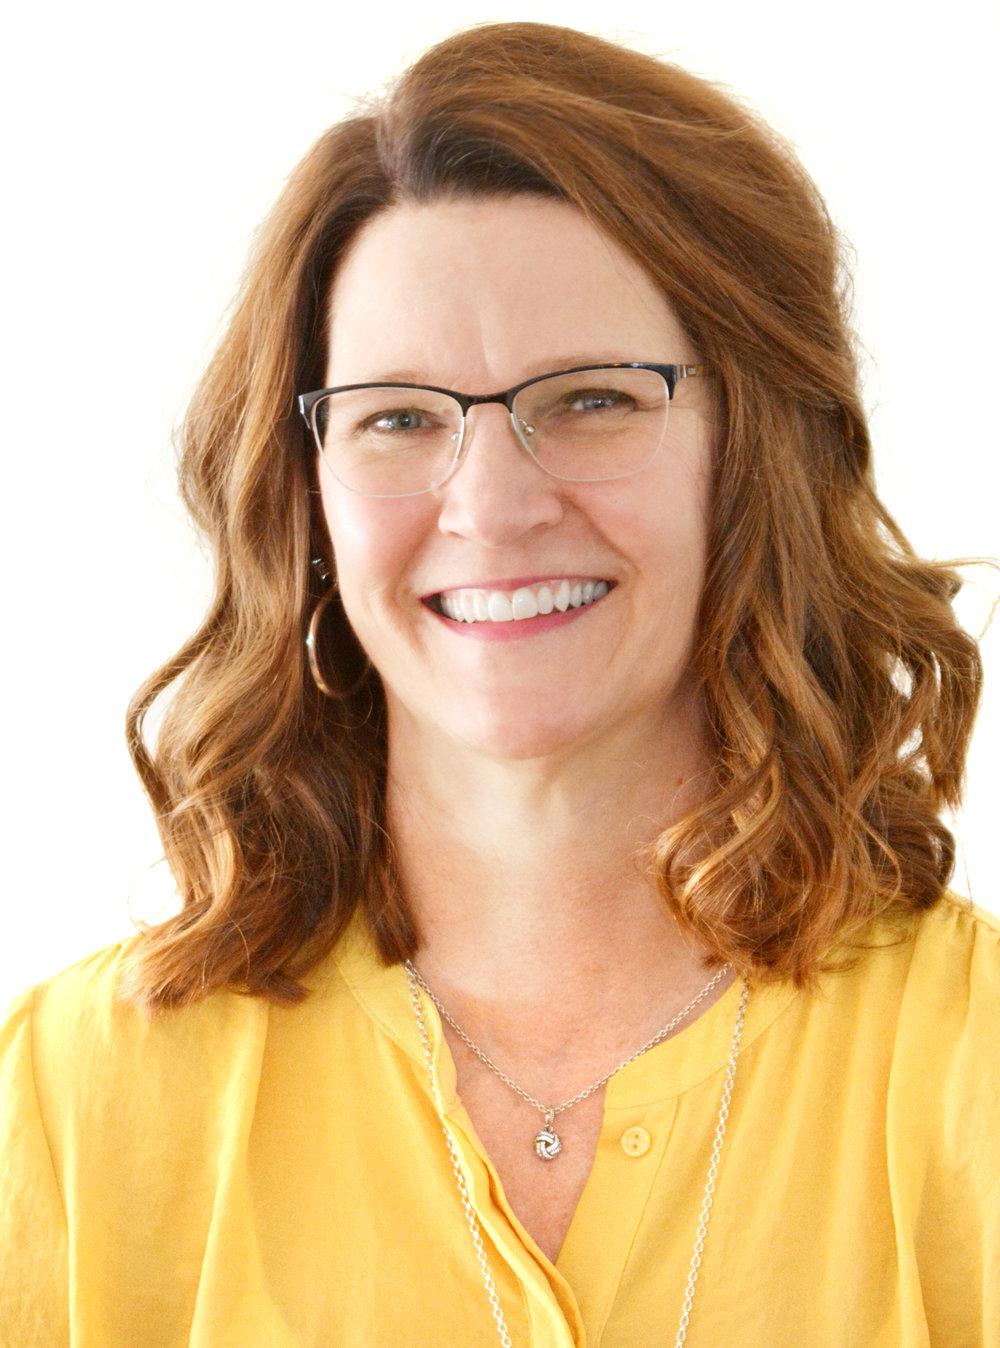 Deb Hessling - Manager